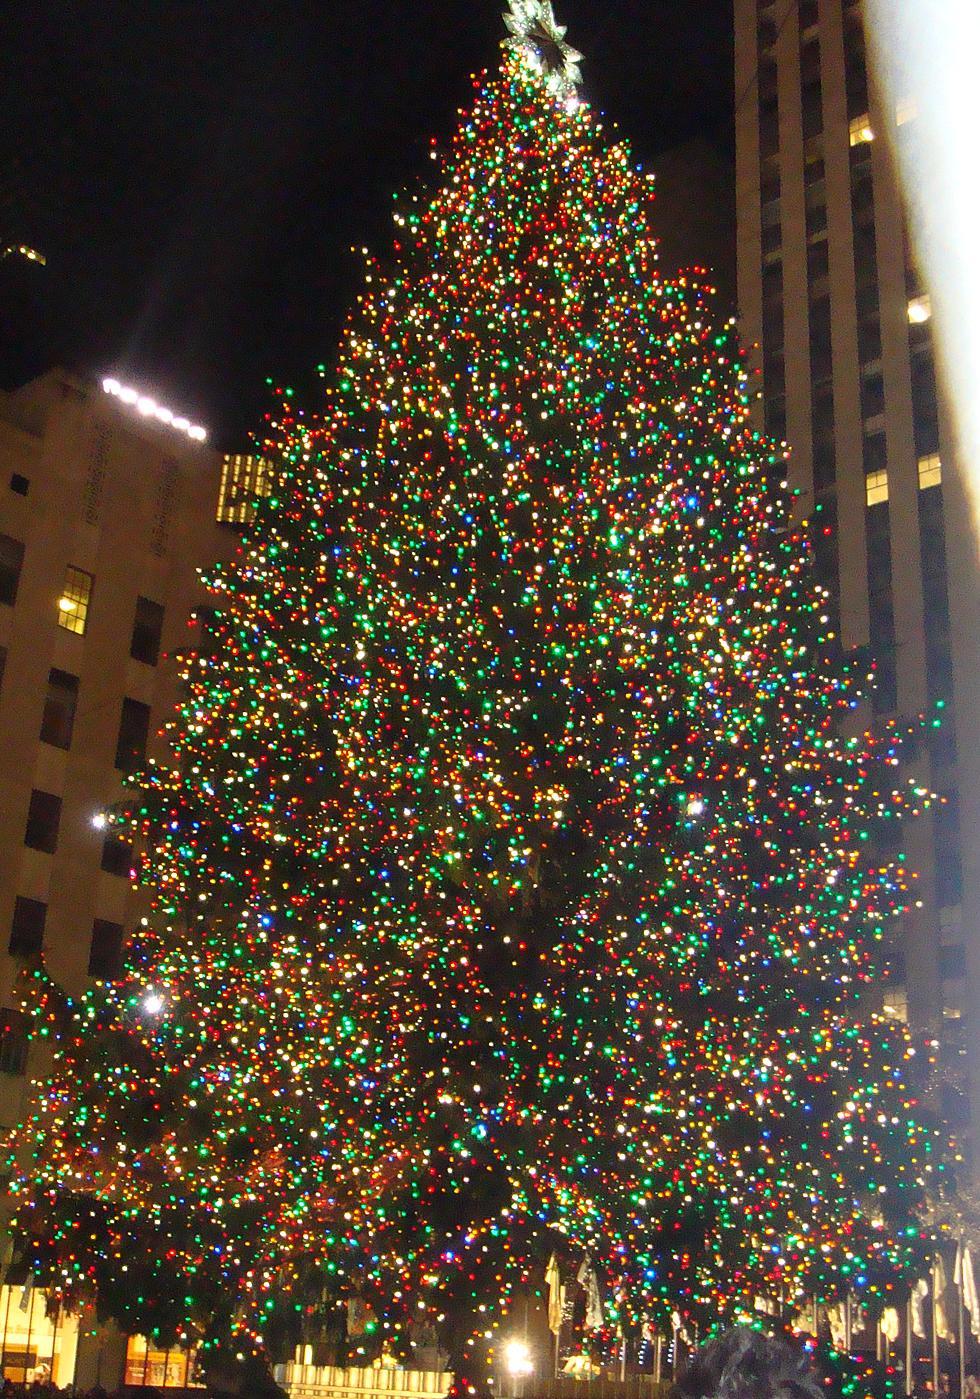 Rockefeller Center Christmas Tree.Transporting The Xmas Tree To Rockefeller Center